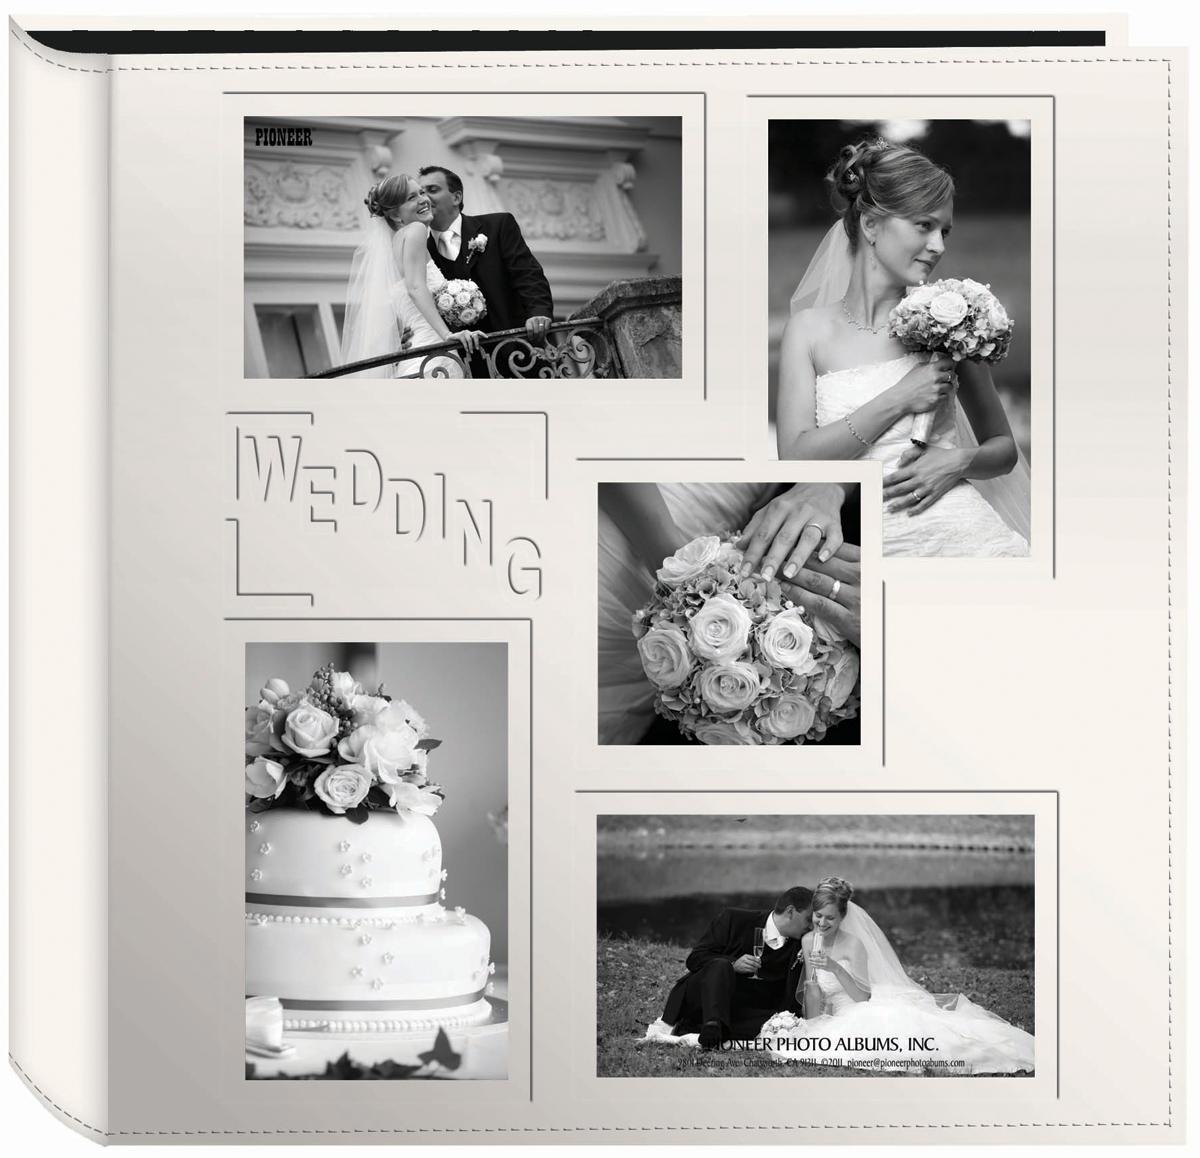 Pioneer 5-Up Sewn Embossed Collage Frame Photo Album 12X12-Wedding